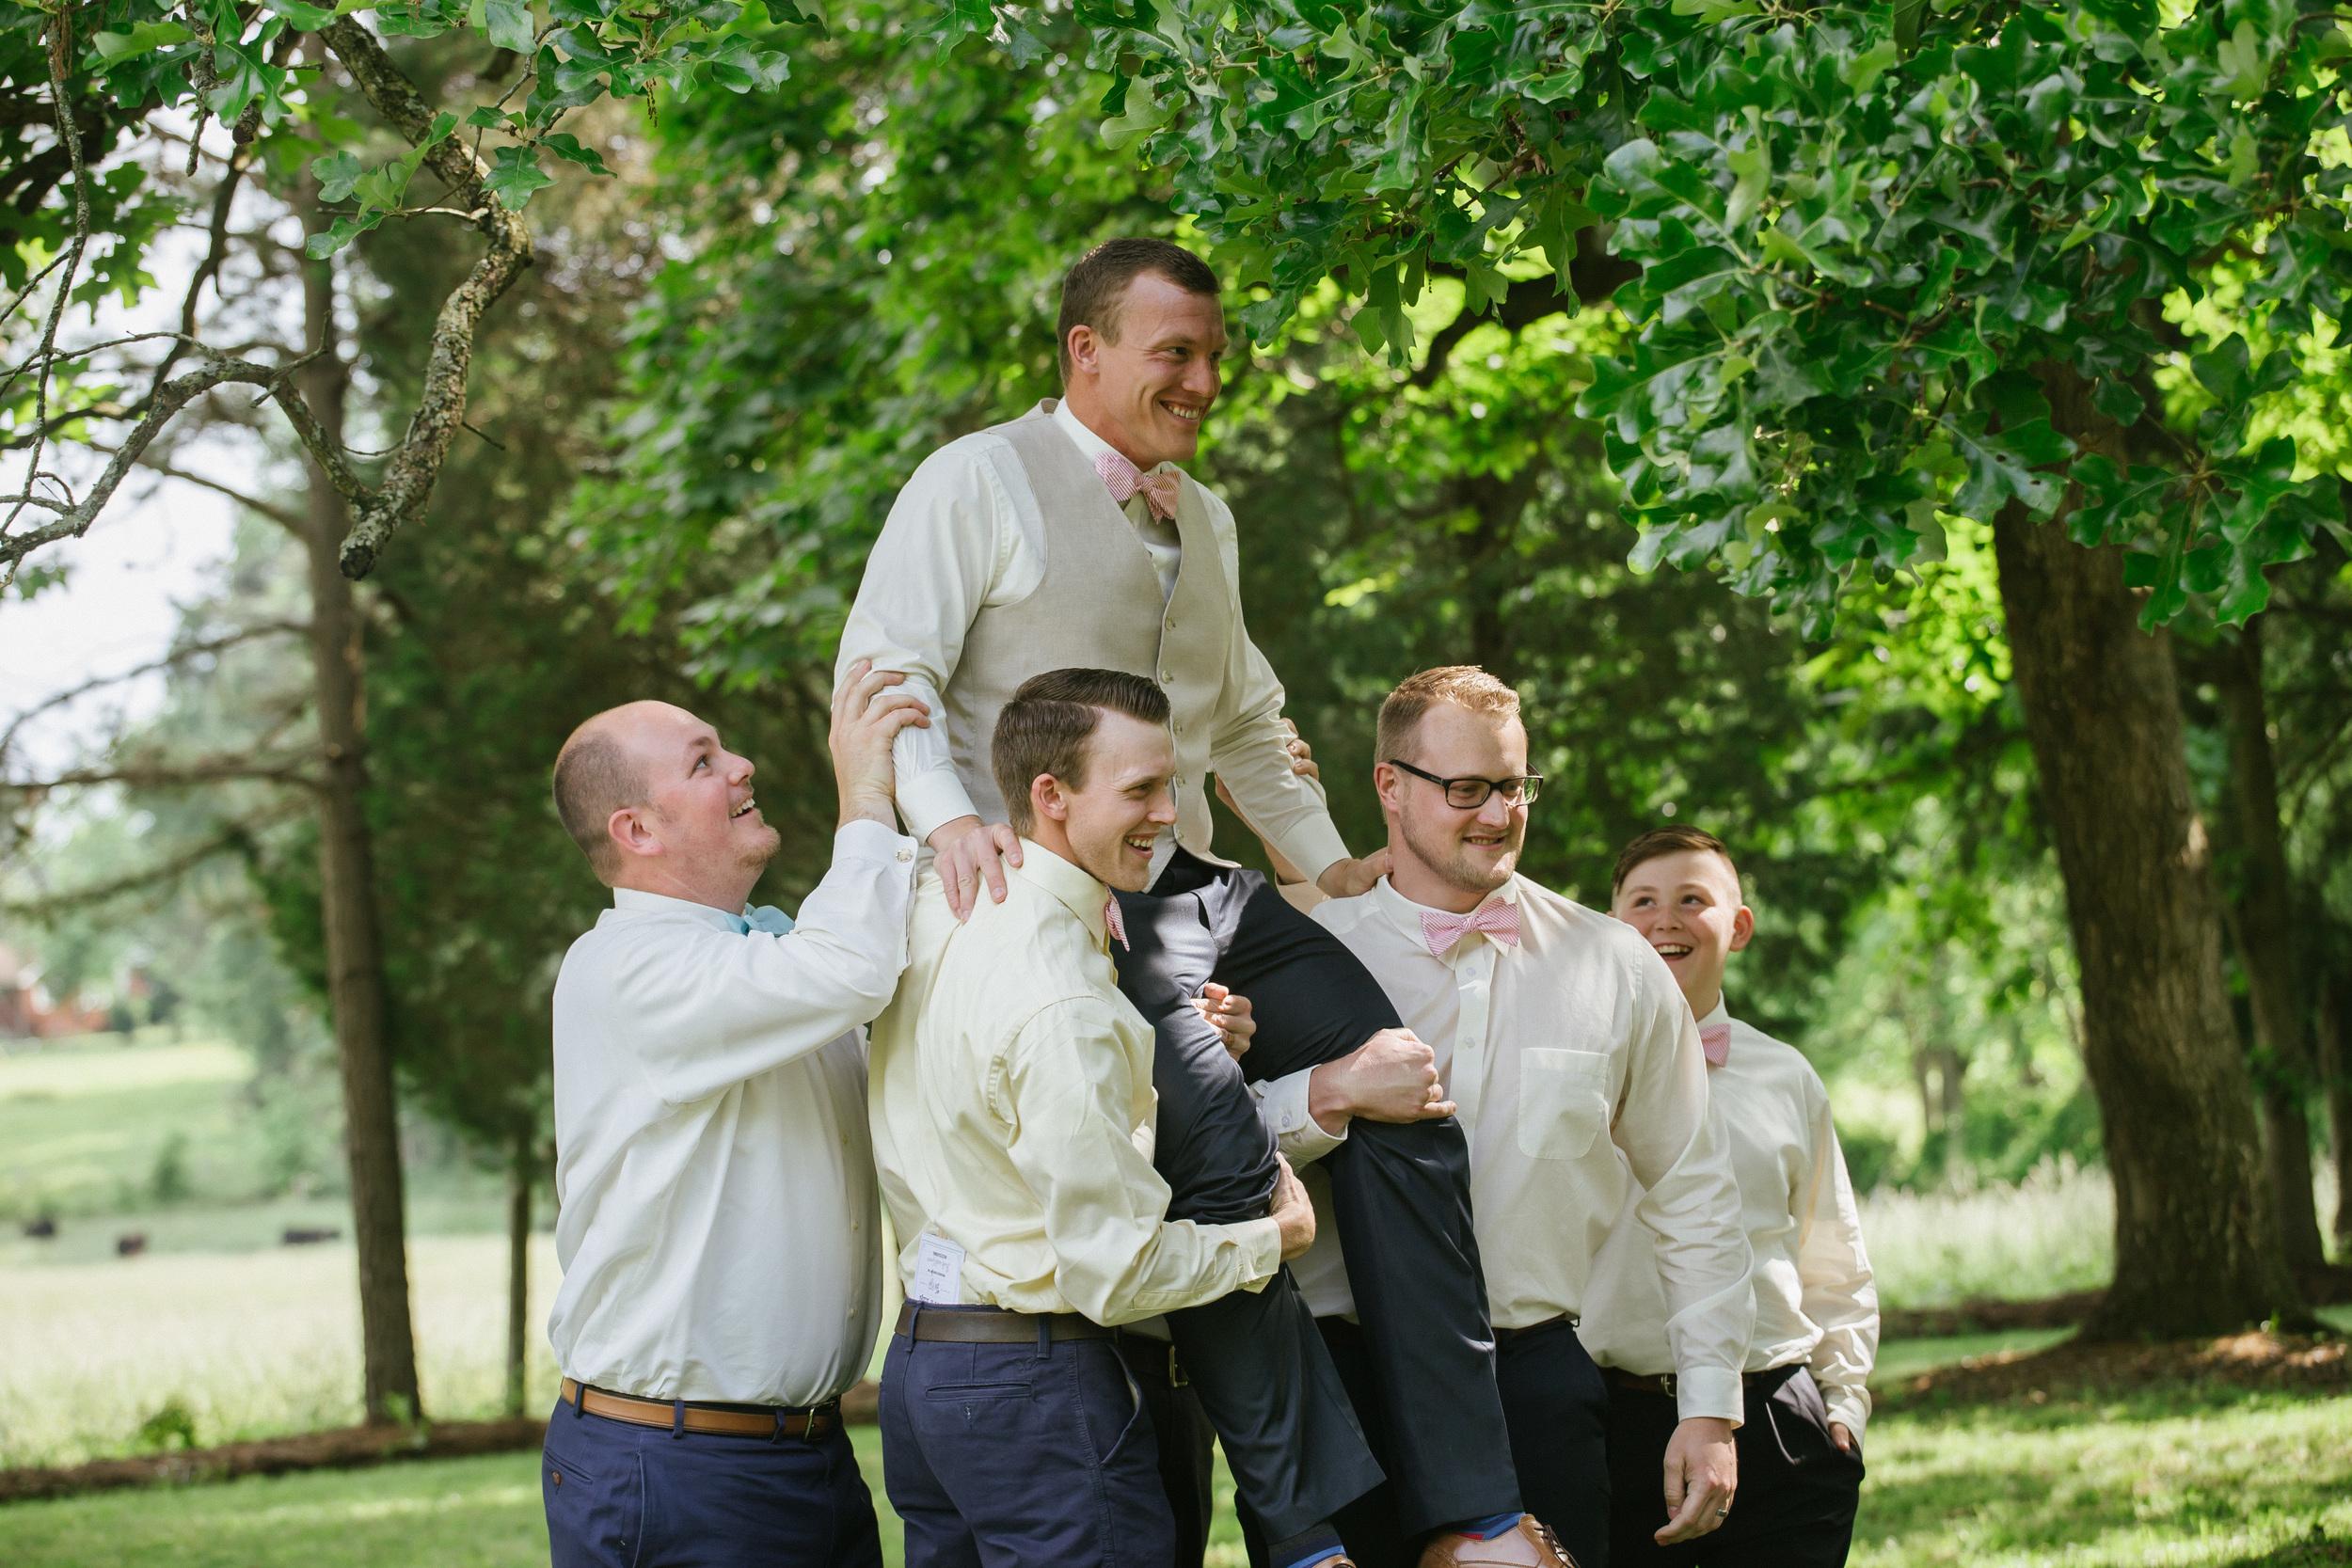 Fun Wedding Pose